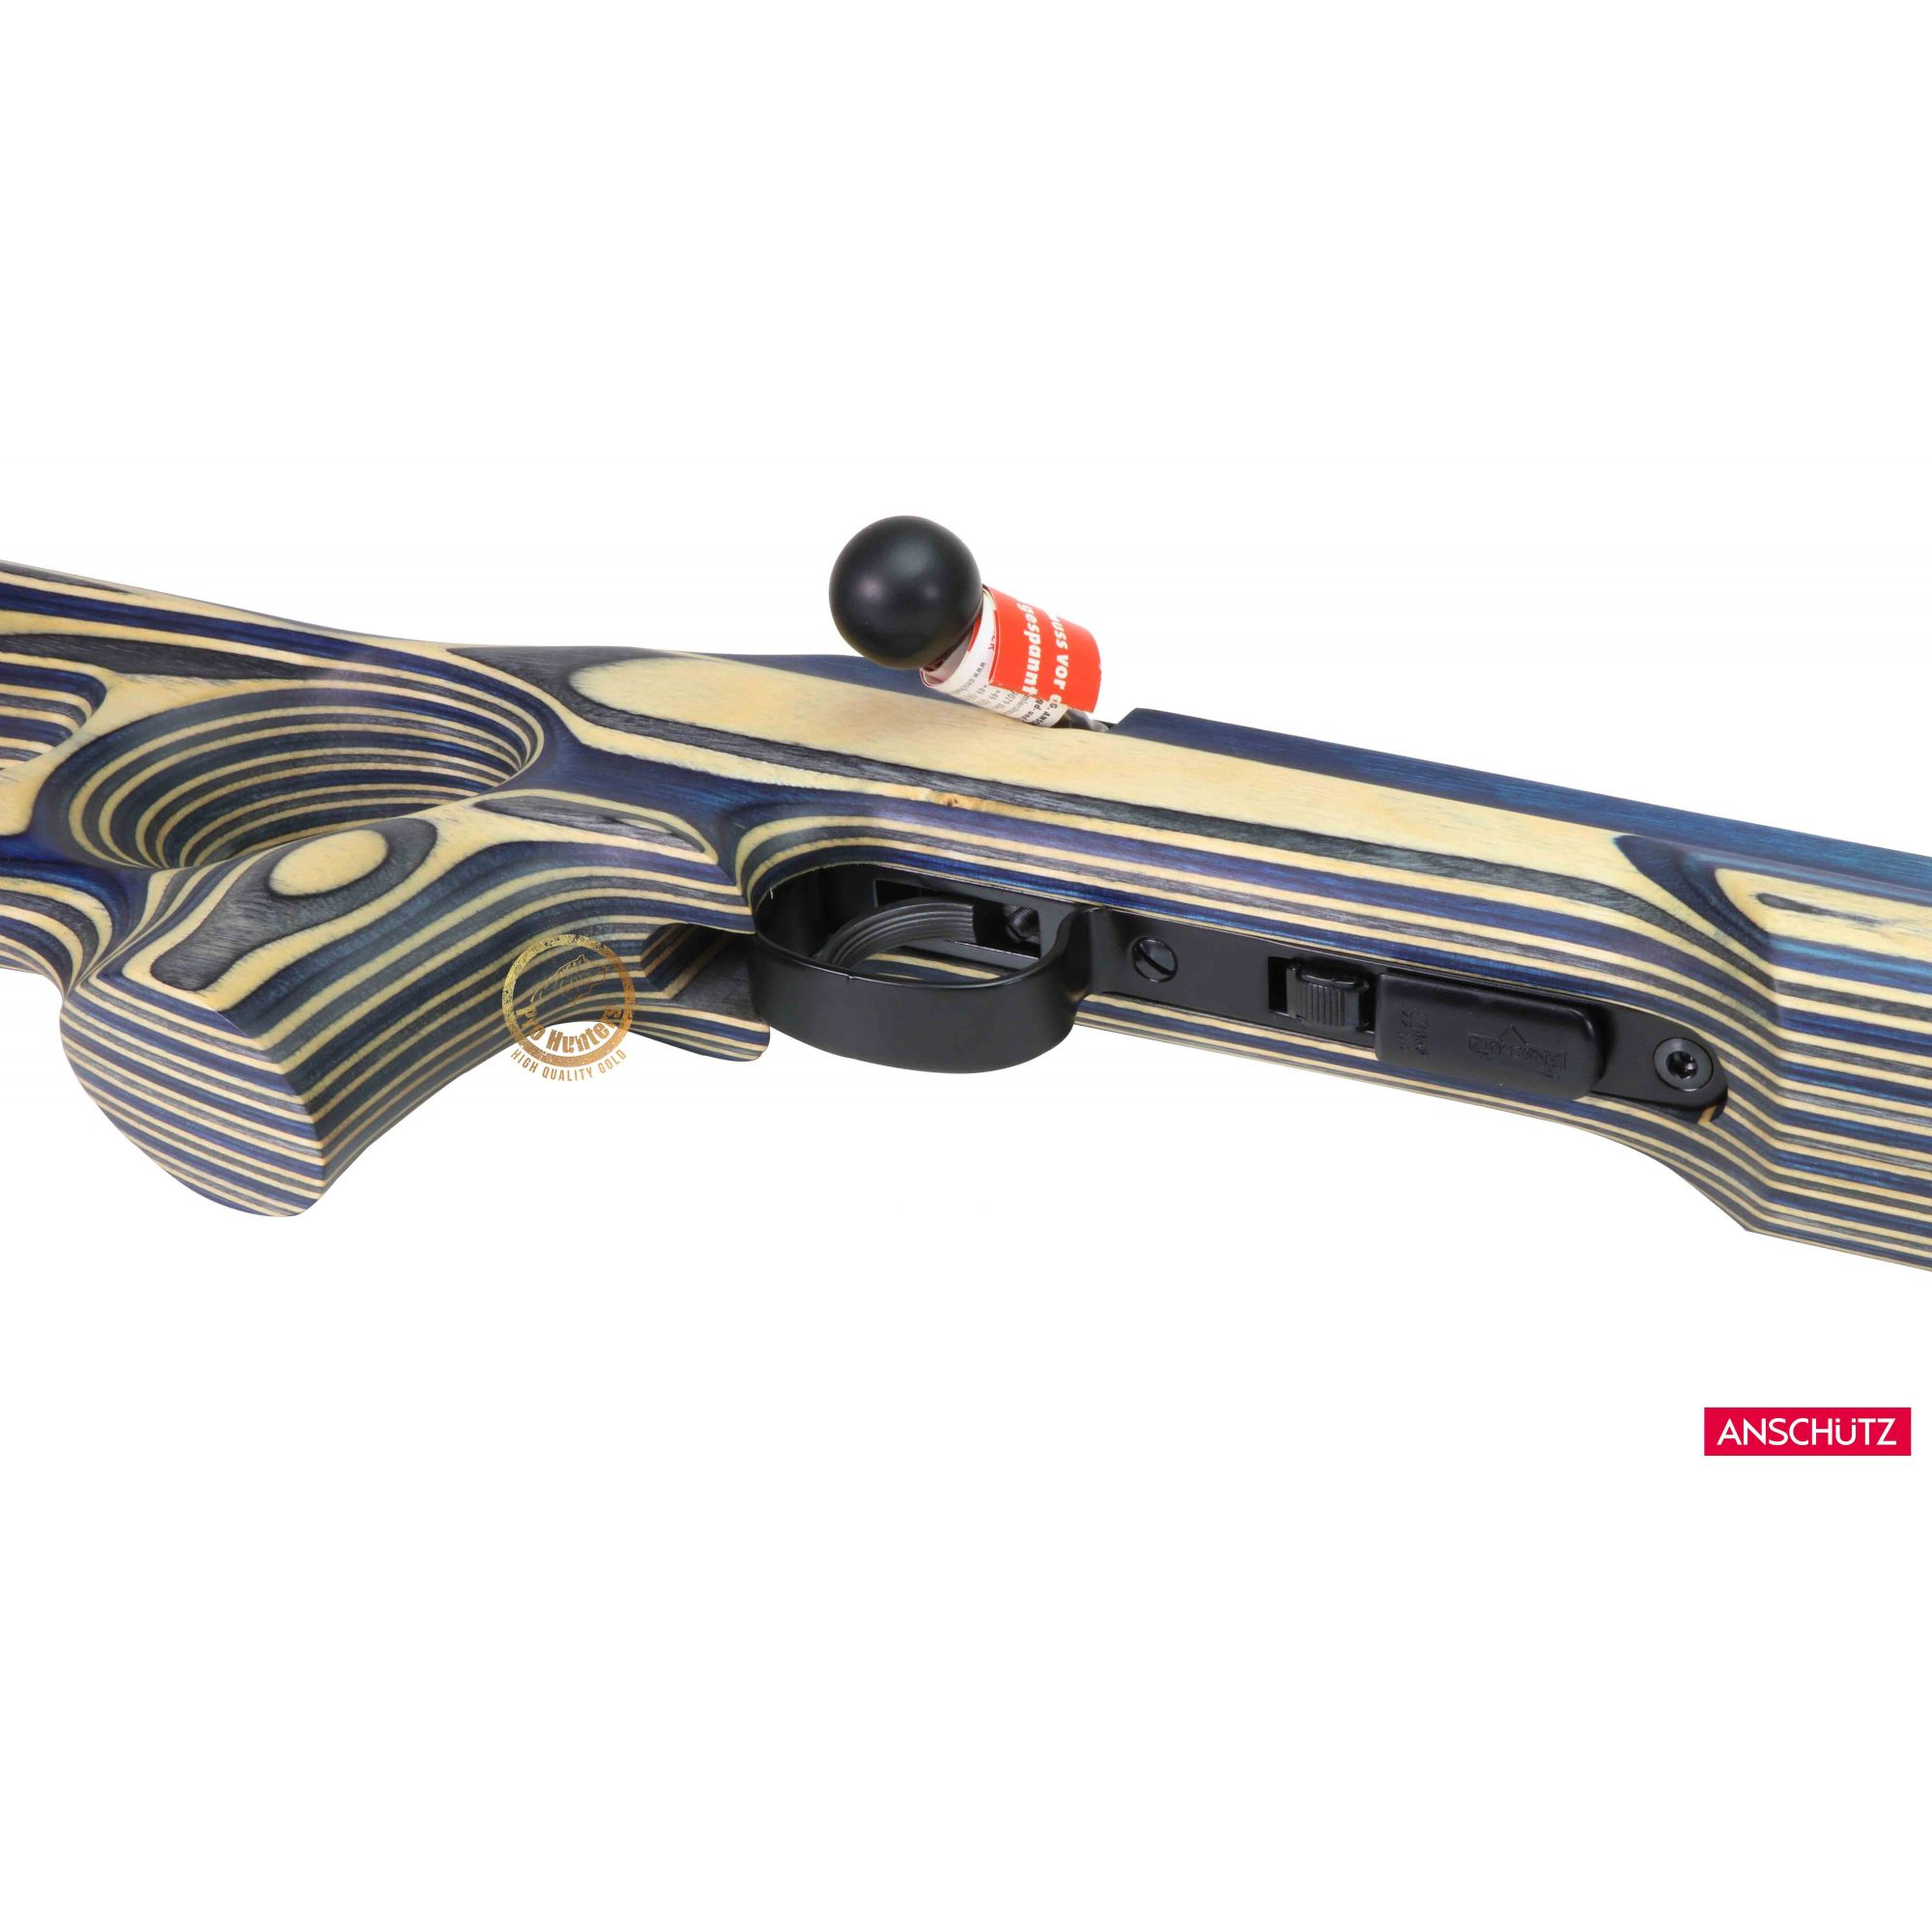 Anschutz - 1416 D HB SH COLOR Thumbhole Stock - Calibre .22 LR  - Venda Exclusiva Para CAC